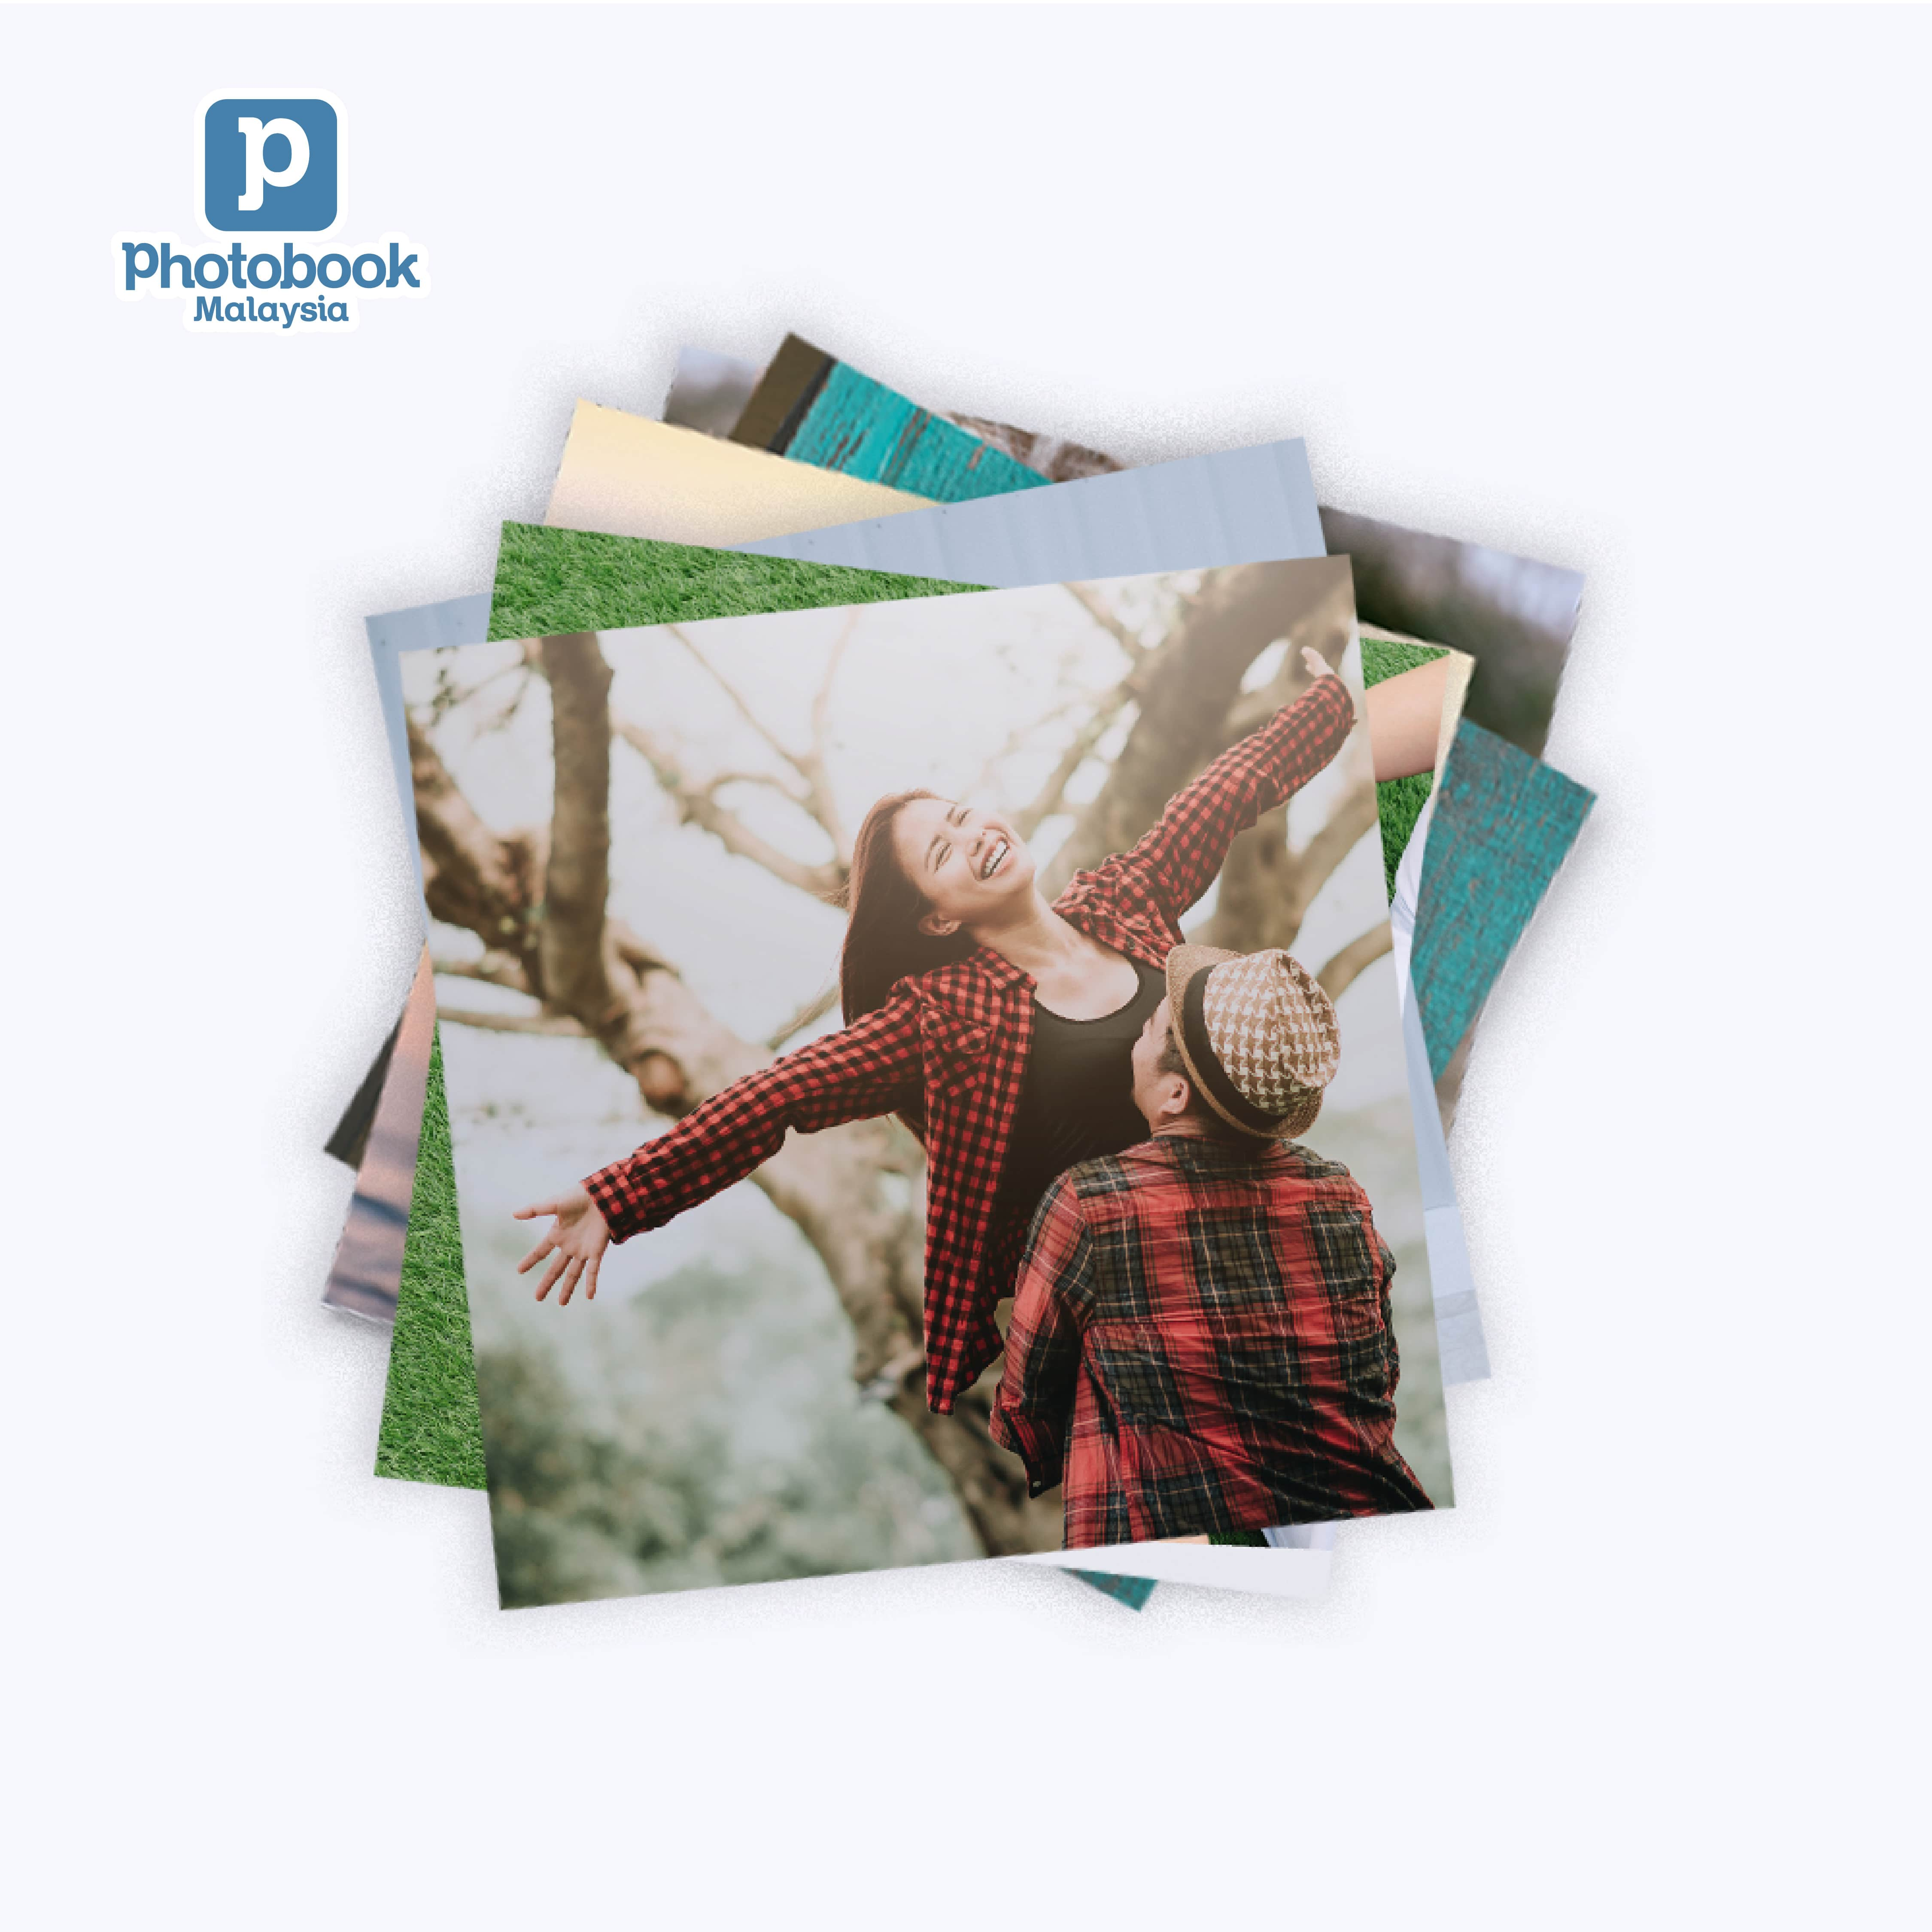 LazChoice [e-Voucher] Photobook Malaysia 50pcs of 4 x 4 Square Photo Prints with FUJIFILM Crystal Paper